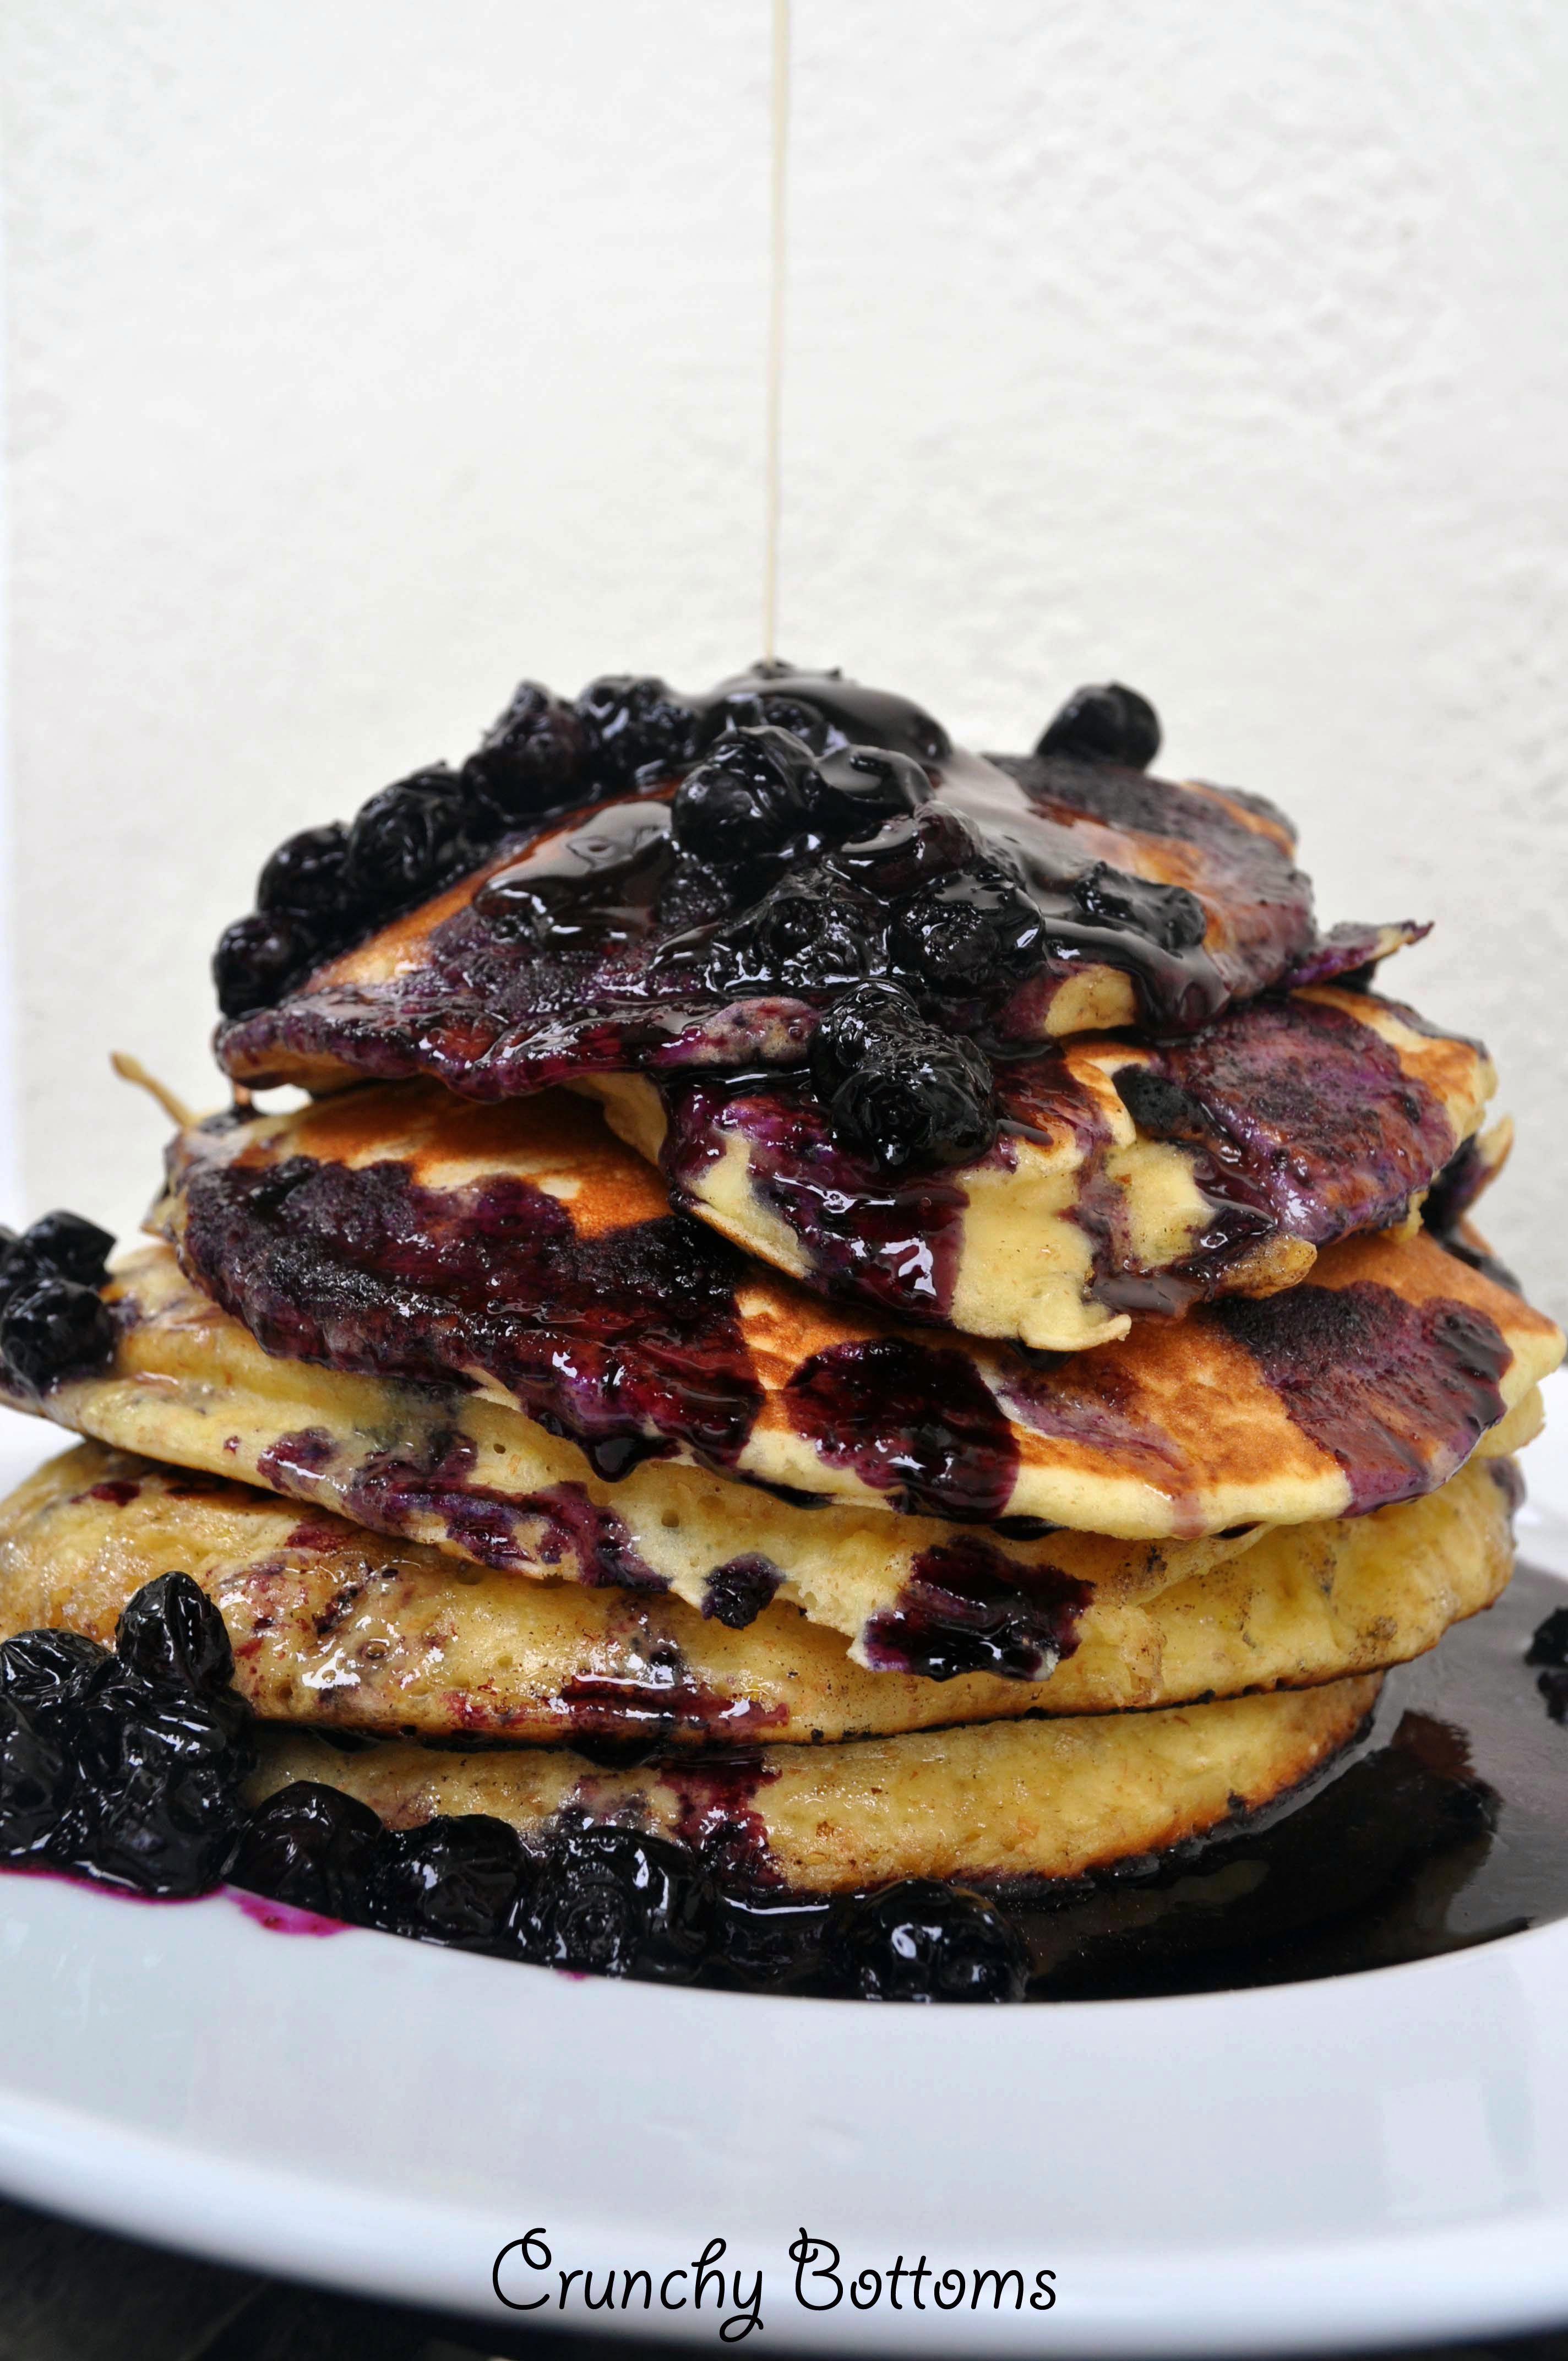 berryblue Crepe cake, Blueberry pancakes, Recipes